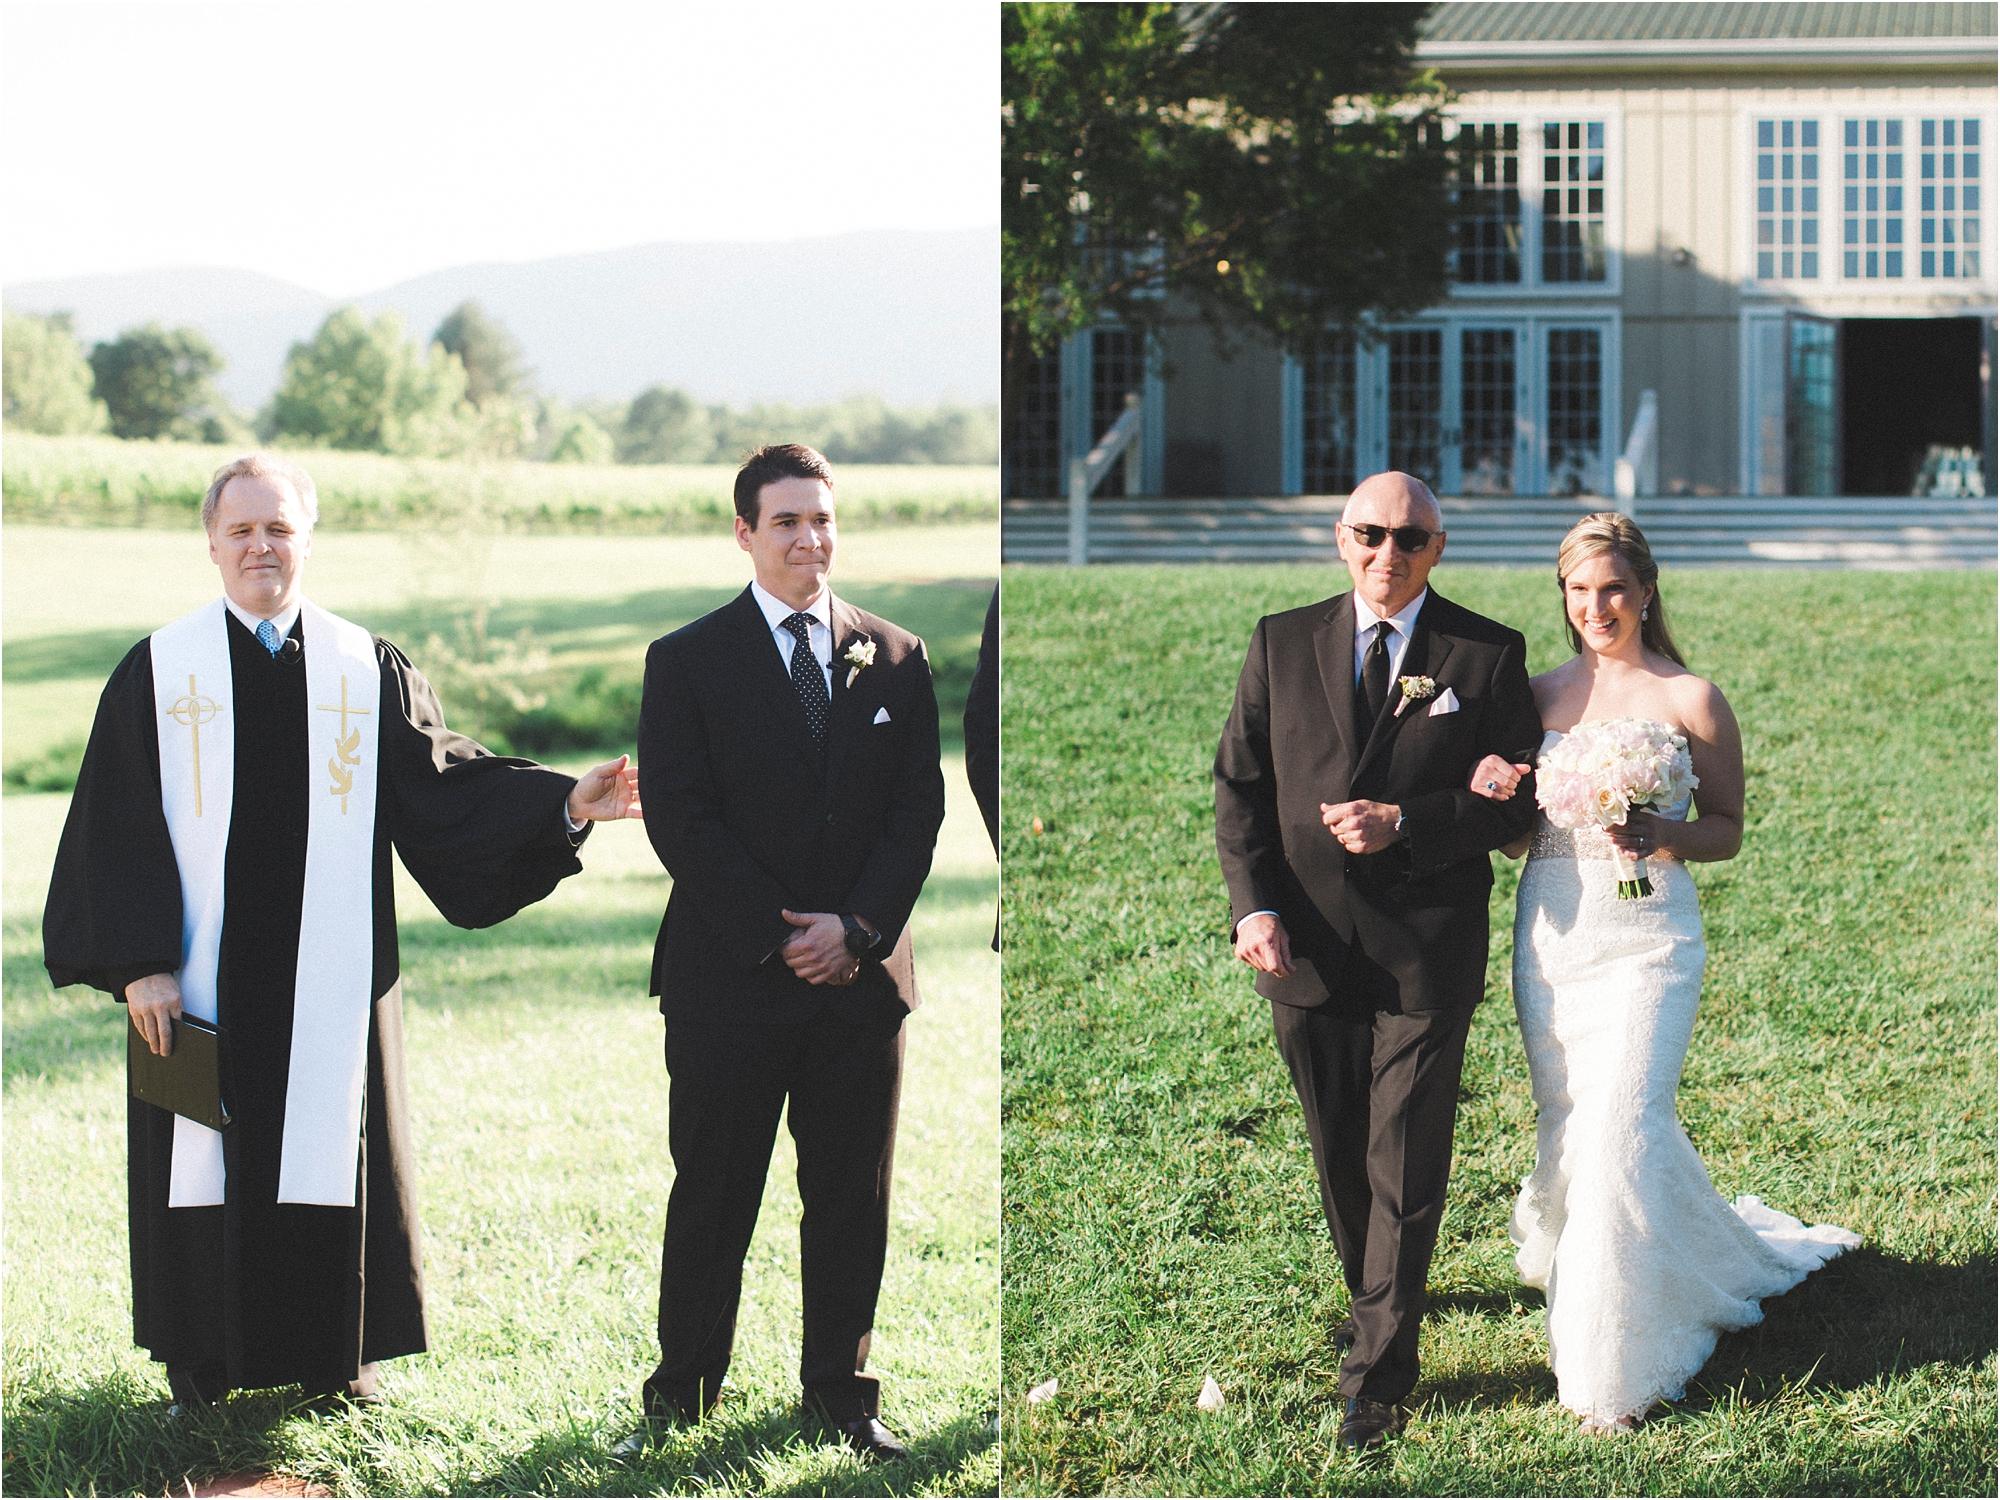 liz-mike-veritas-winery-charlottesville-virginia-wedding-photos_0015.jpg